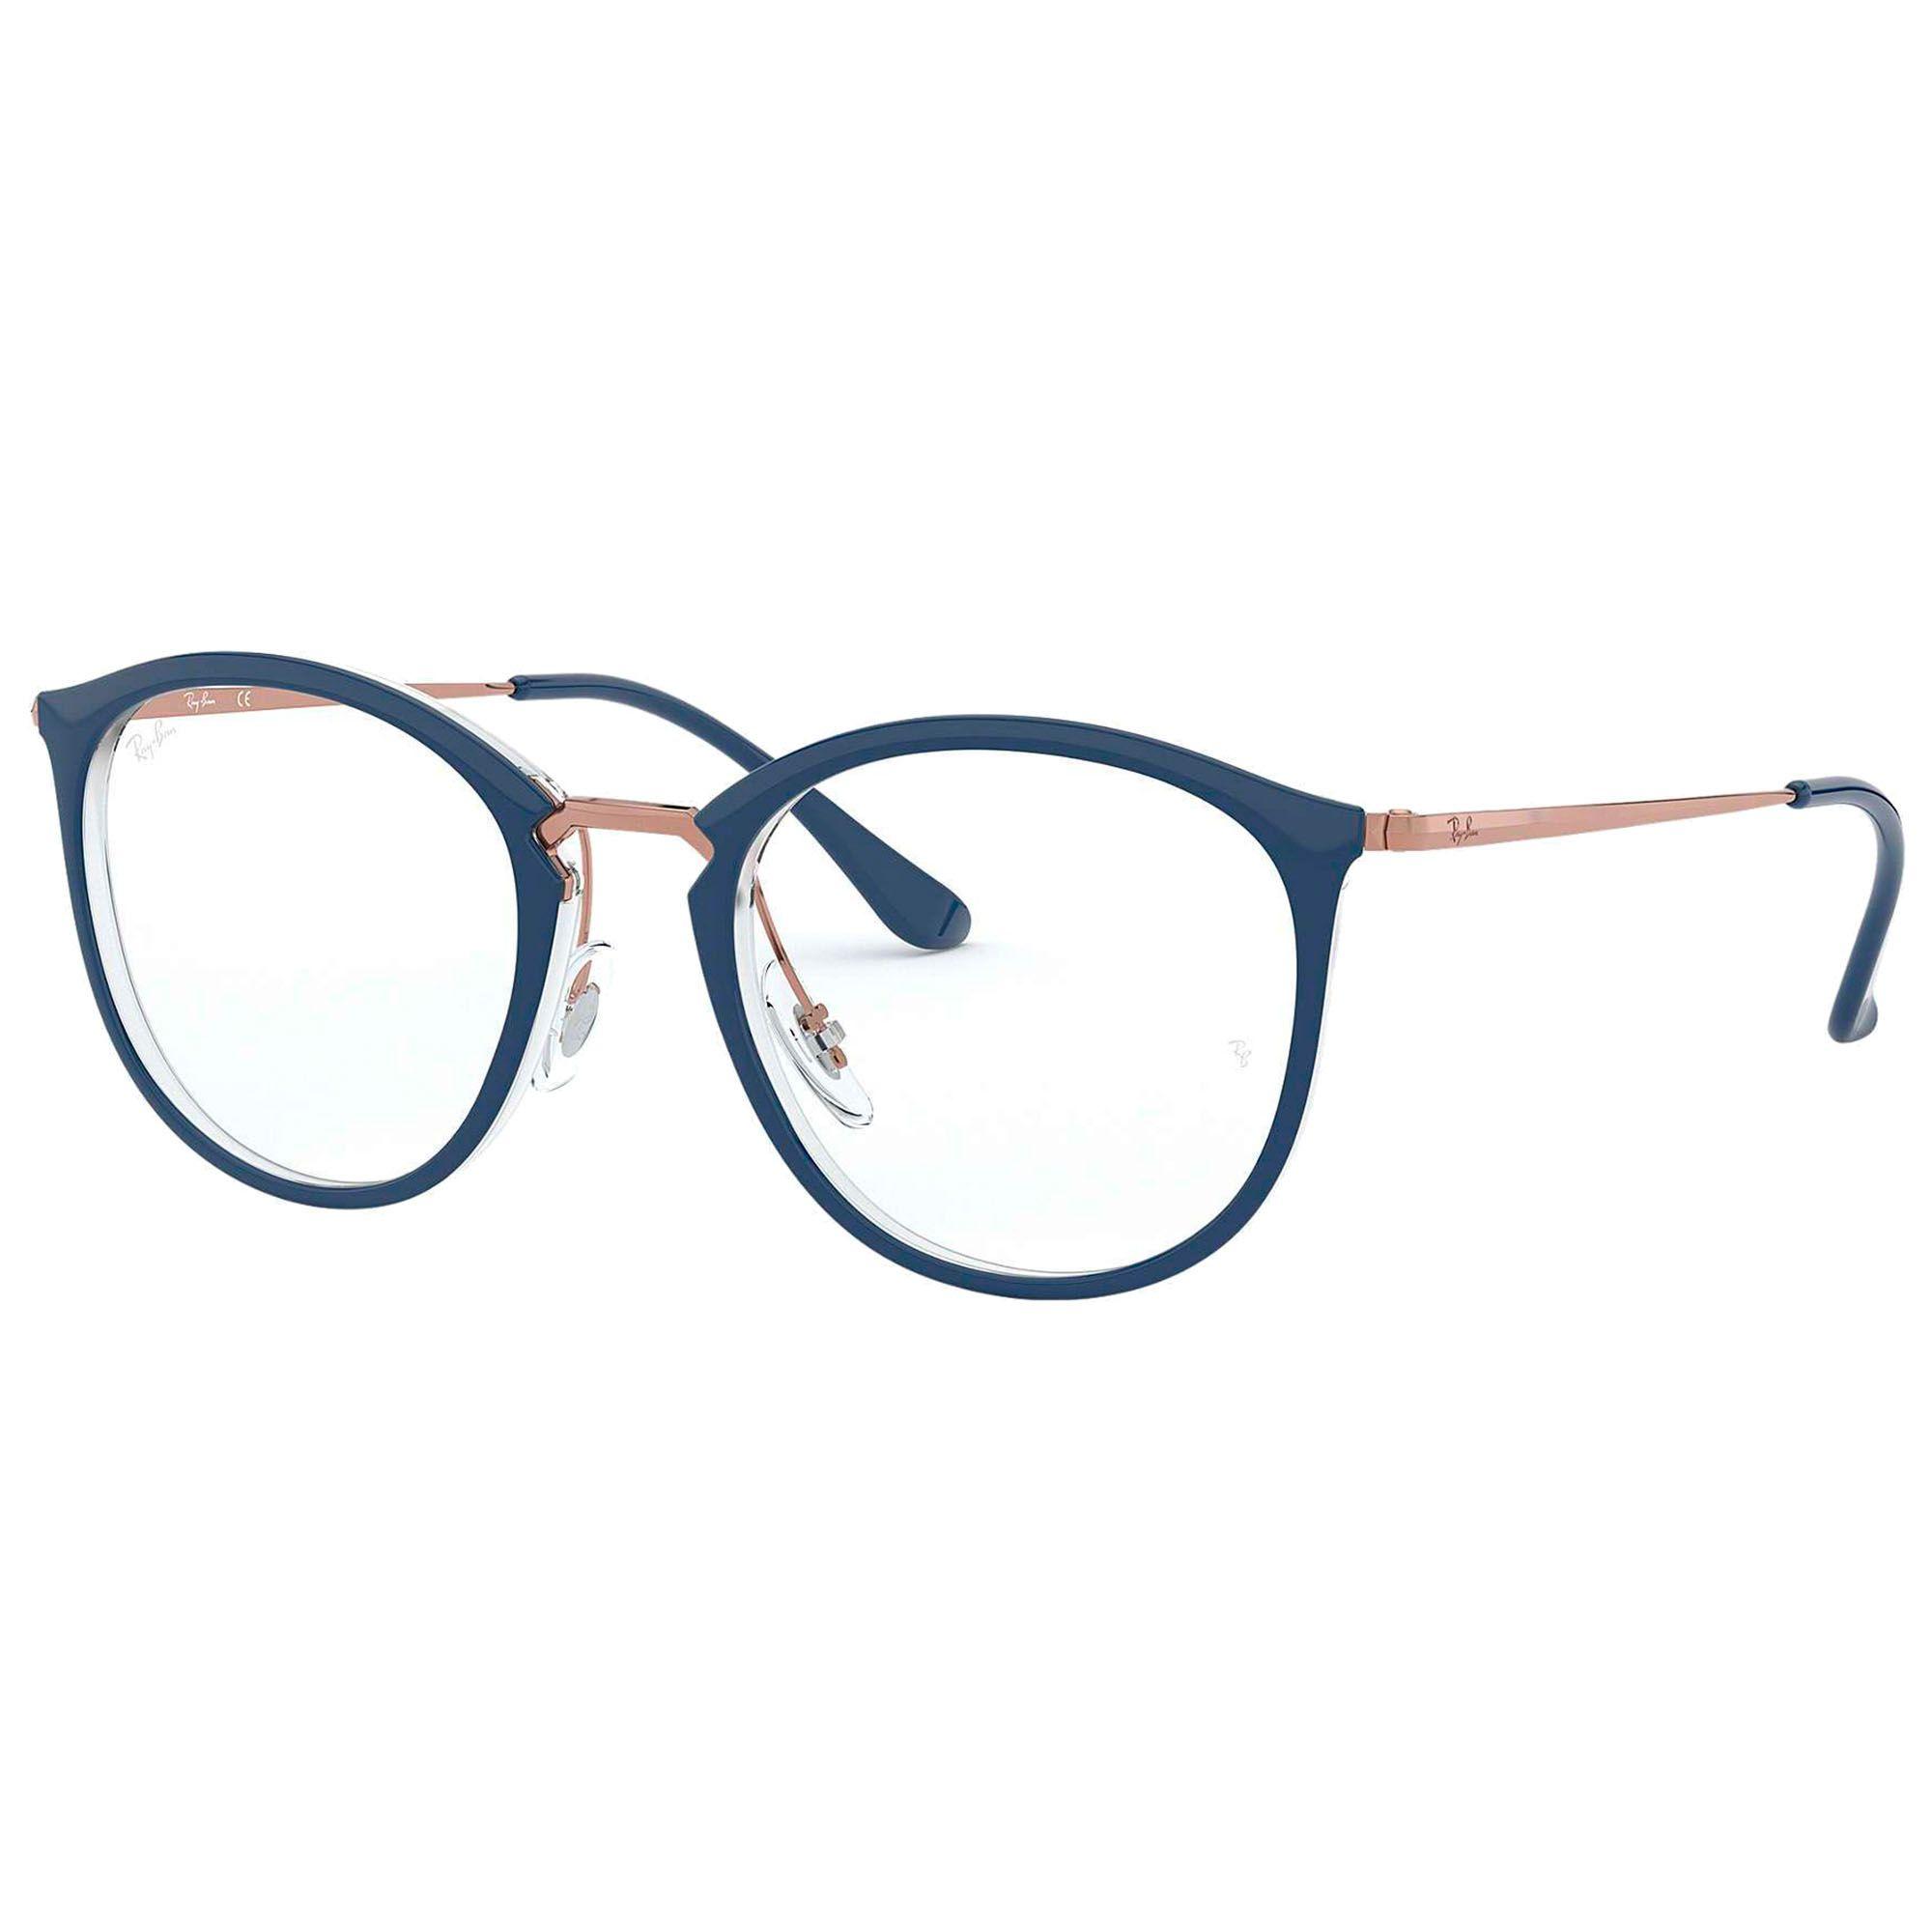 Óculos de Grau Feminino Ray-Ban RB7140 5853 51-20